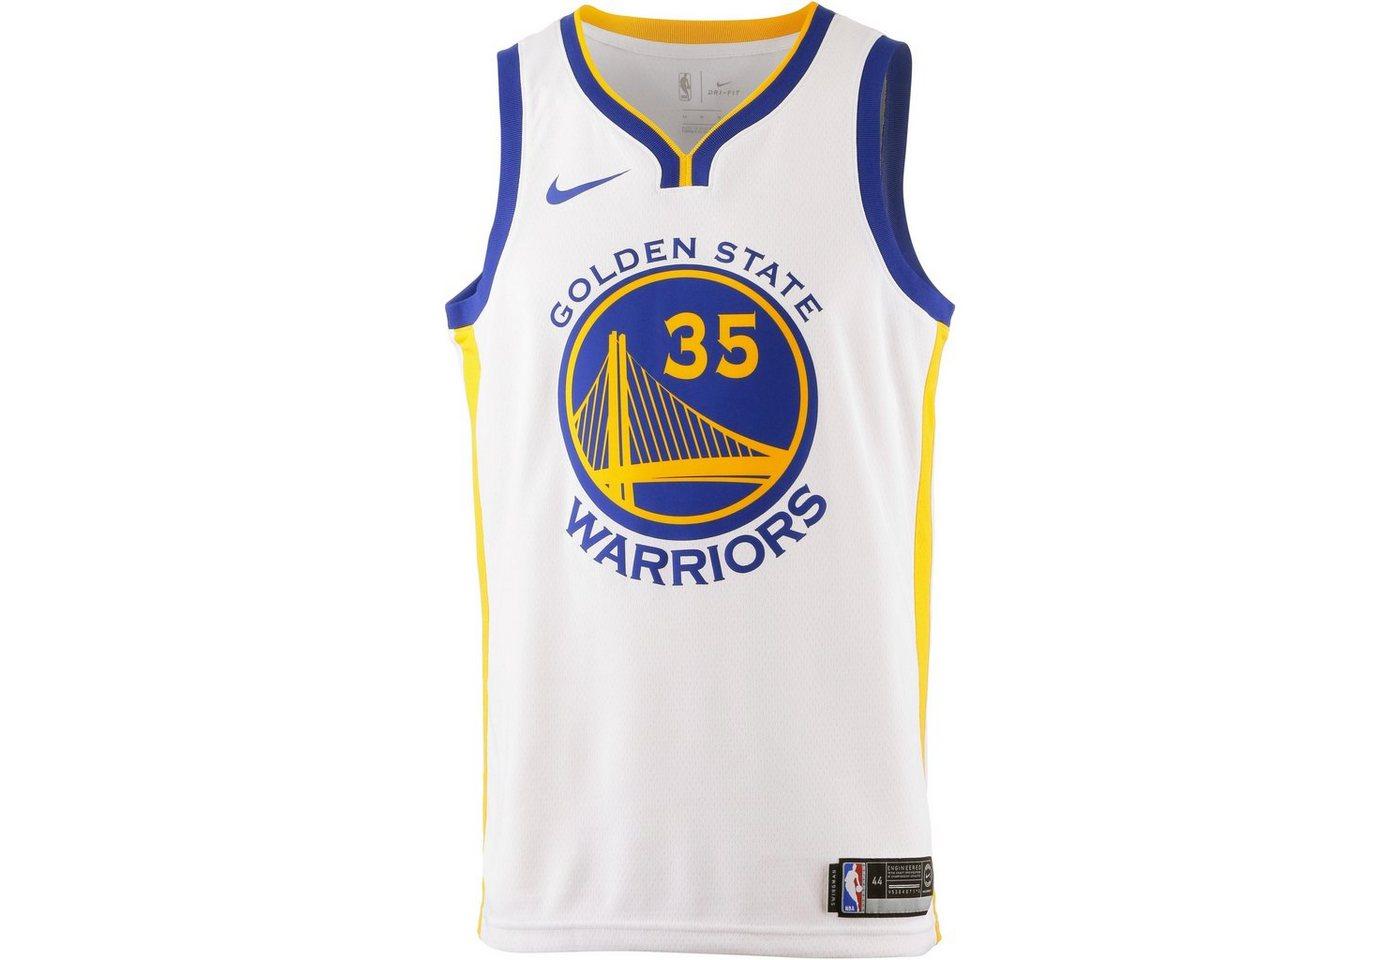 Nike Basketballtrikot »KEVIN DURANT GOLDEN STATE WARRIORS« | Sportbekleidung > Trikots > Basketballtrikots | Weiß | Polyester | Nike